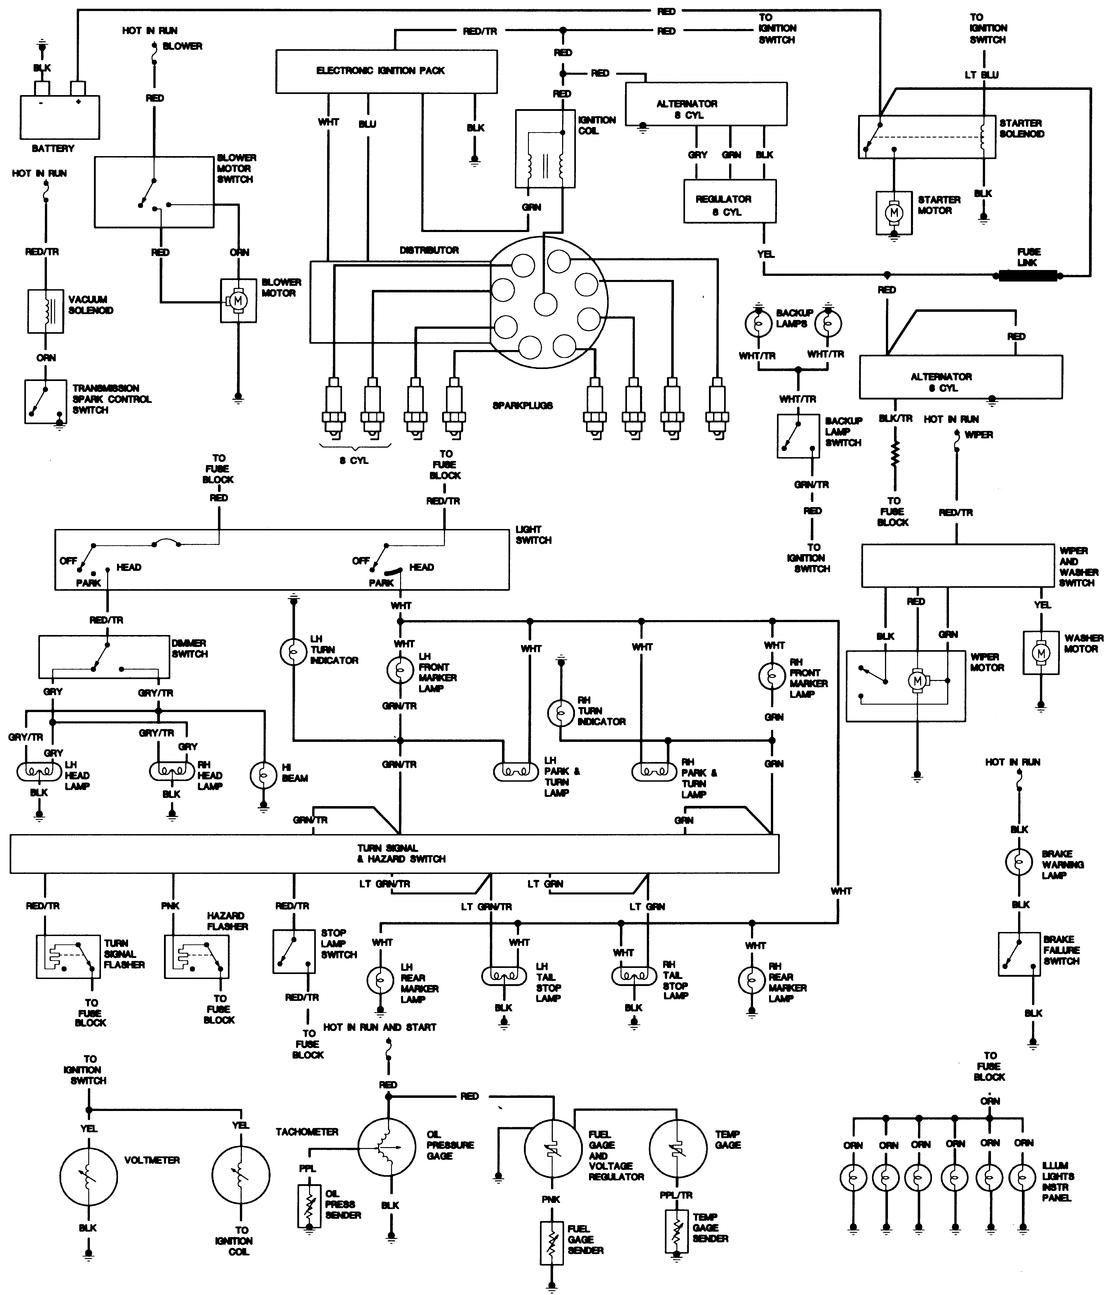 Stupendous 1980 Jeep Cj7 Wiring Diagram Wiring Diagram Wiring Cloud Ittabisraaidewilluminateatxorg